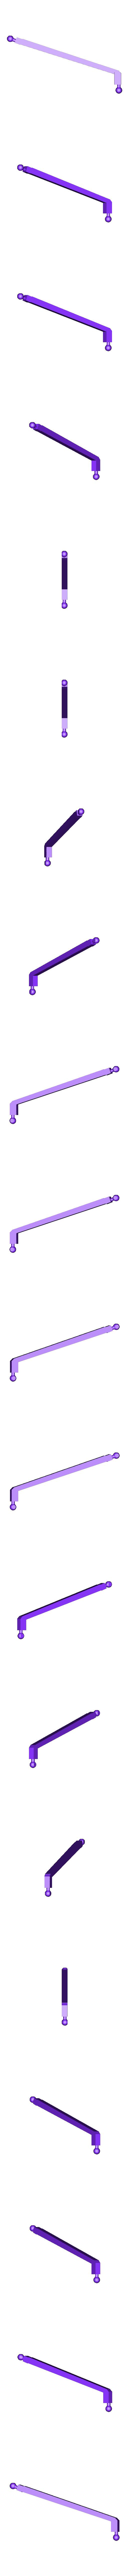 roll_arm.stl Download free STL file Joystick PS4 • 3D print object, Osichan